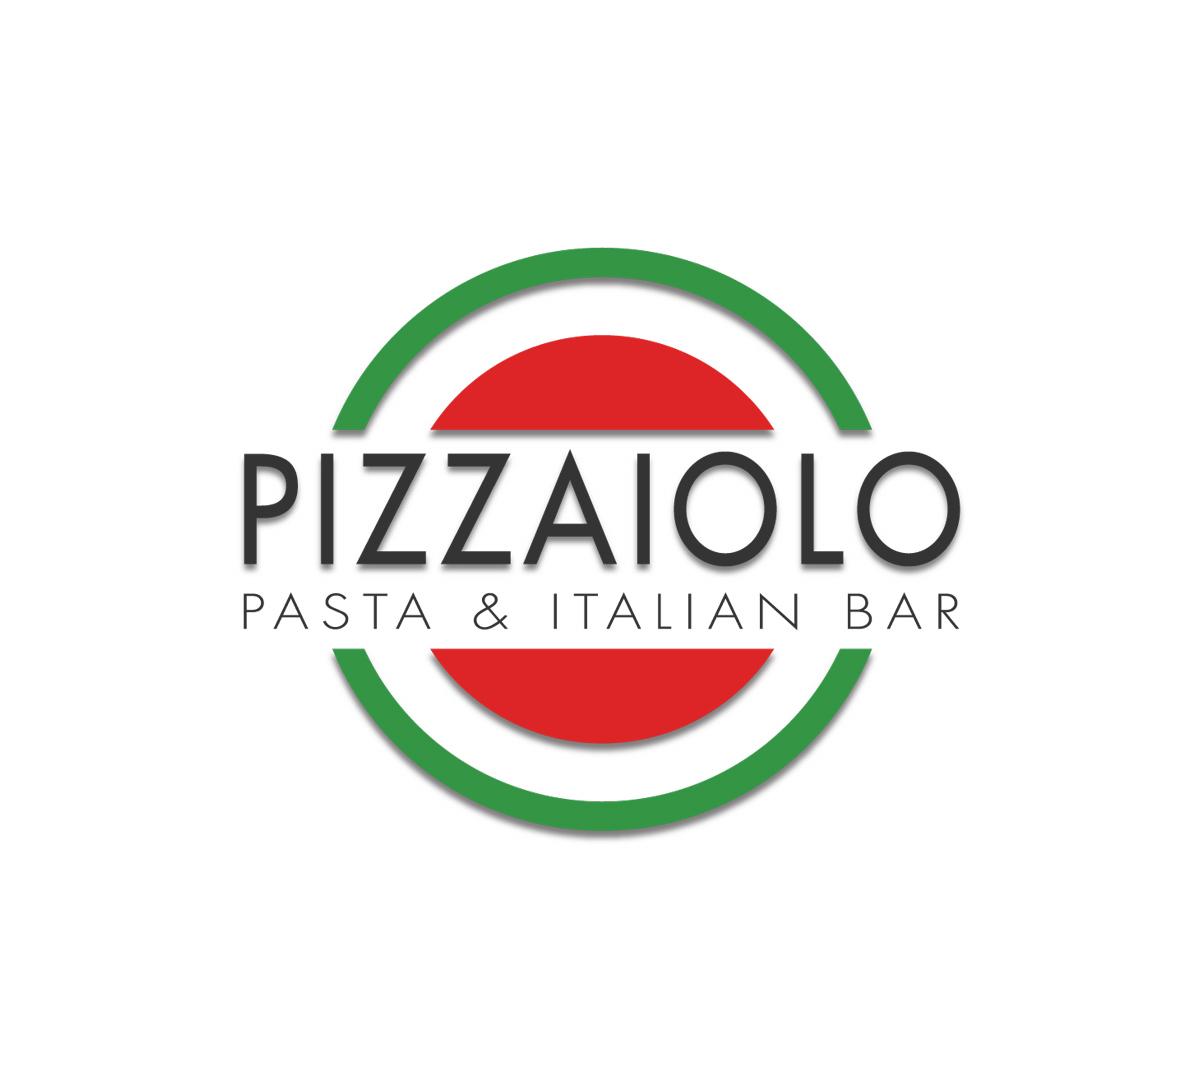 italian restaurant logos rh logolynx com italian restaurant logo game italian restaurants logos with a flag